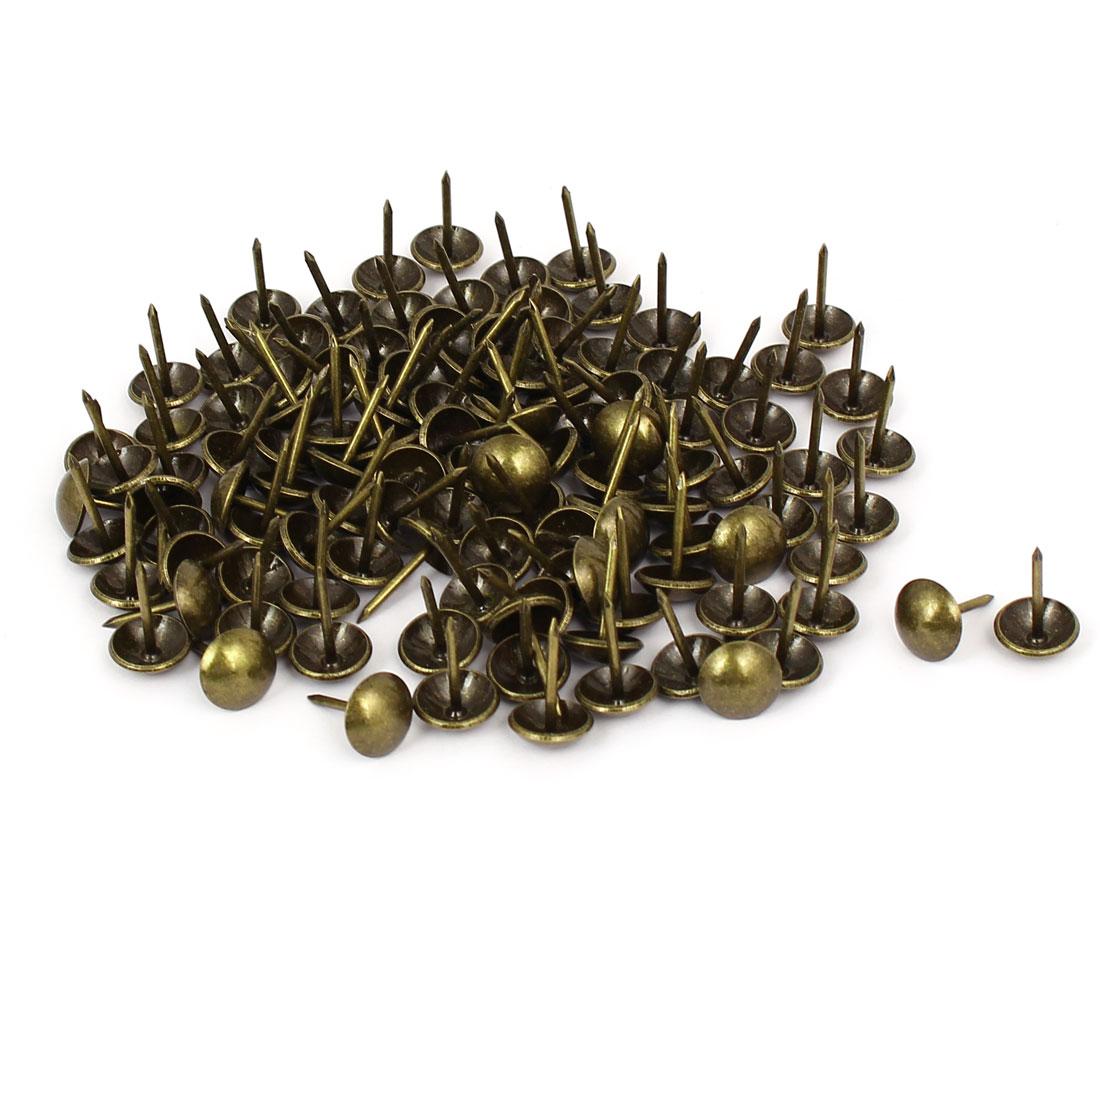 "7/16"" Head Dia 17mm Height Upholstery Tack Nail Push Pin Bronze Tone 120pcs"